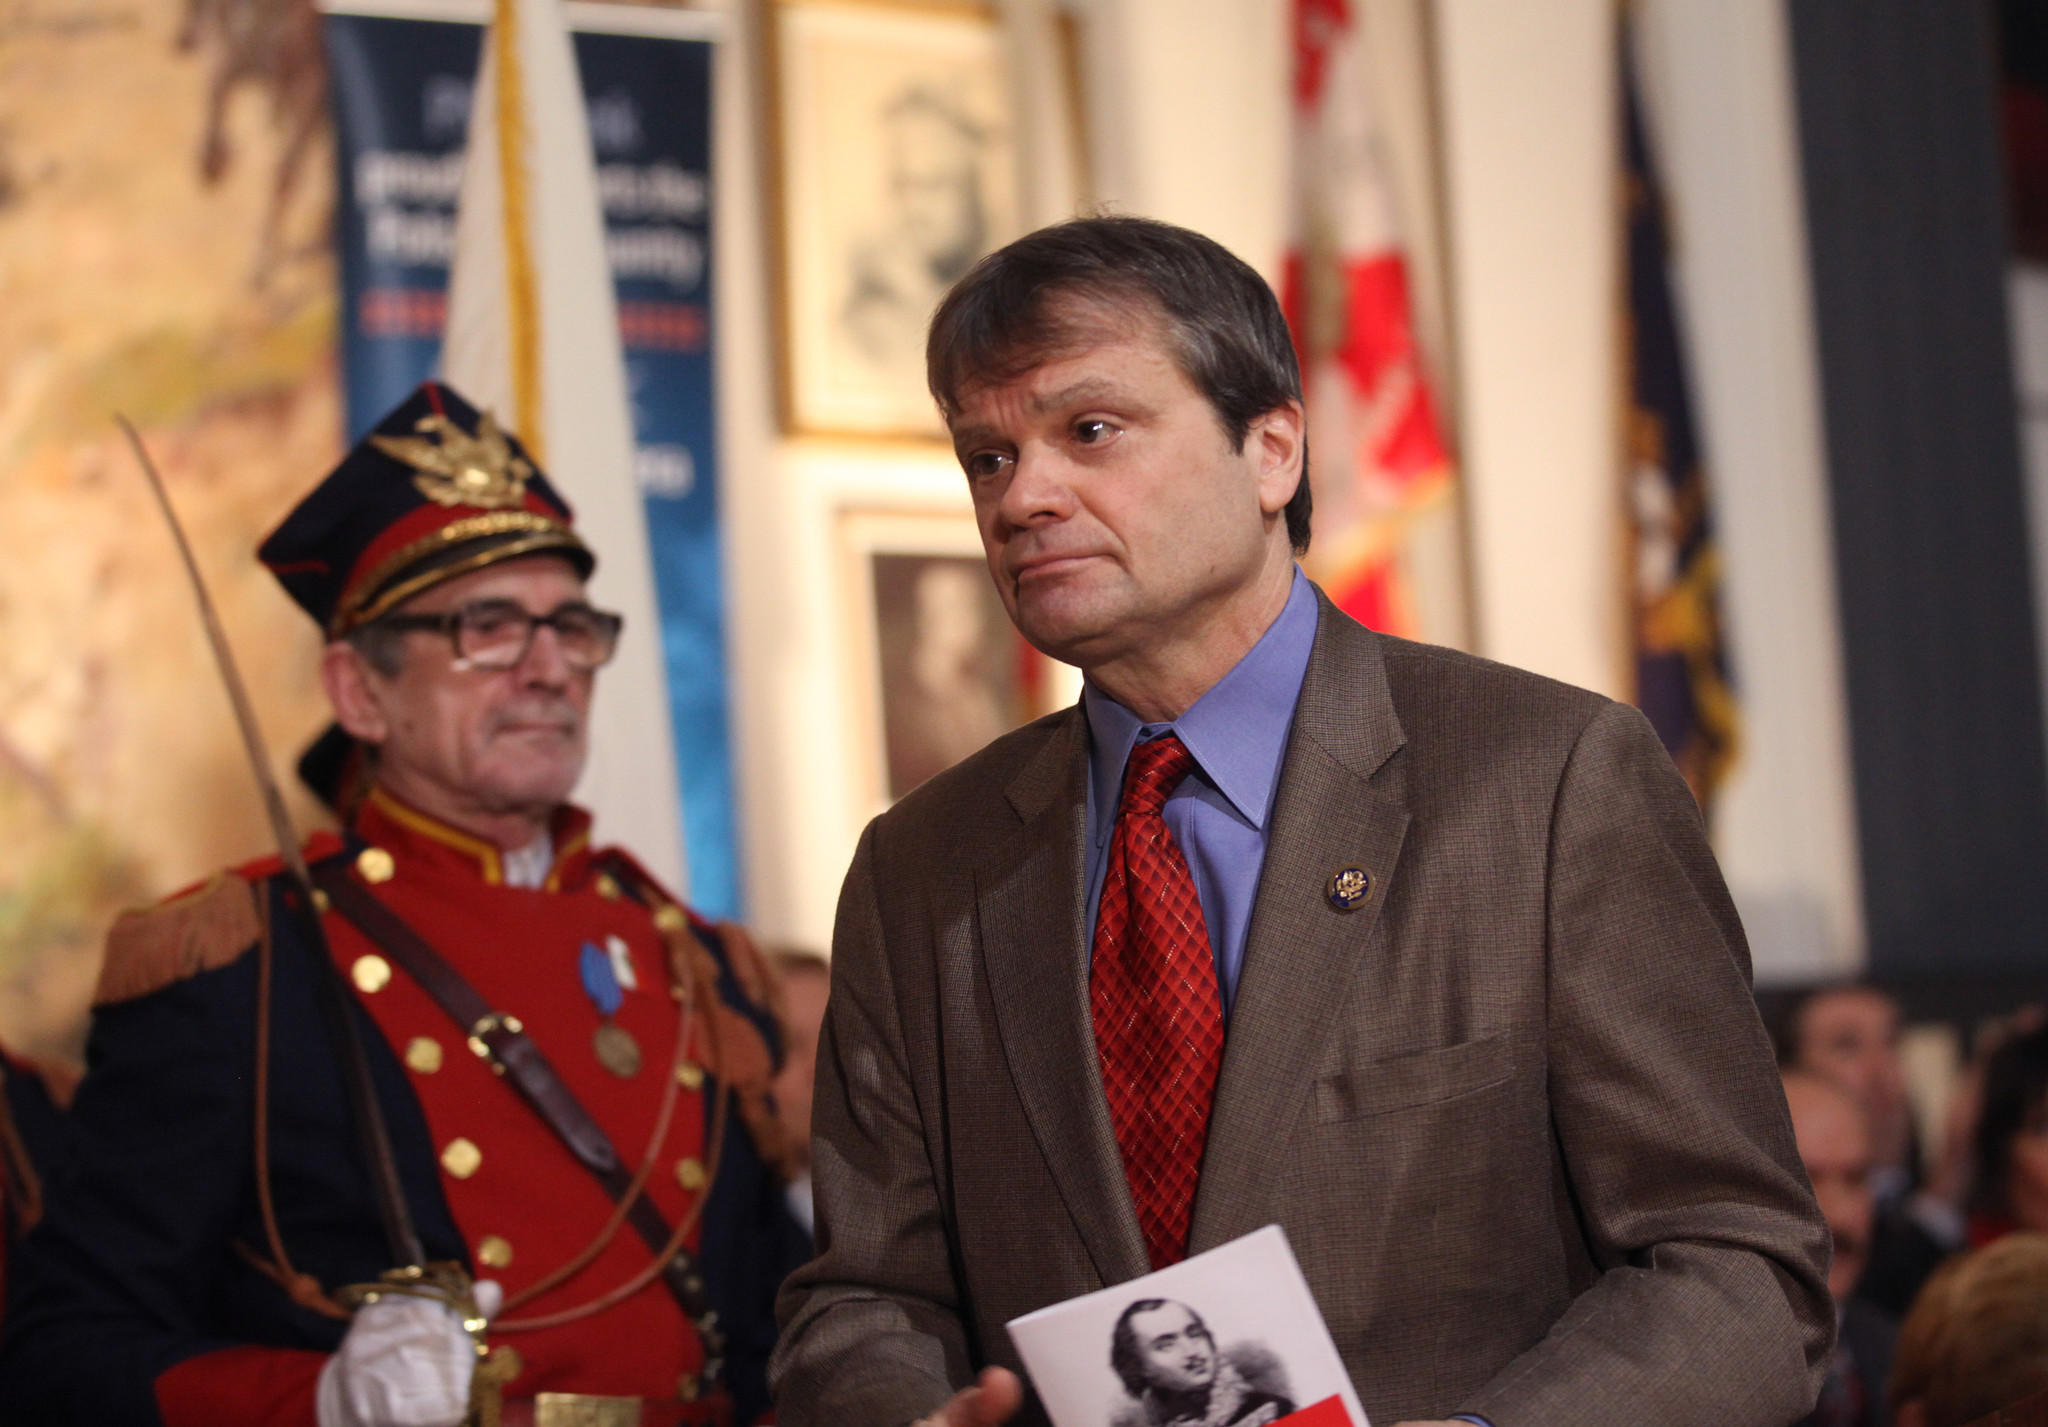 Congressman Mike Quigley during Pulaski Day celebrations.